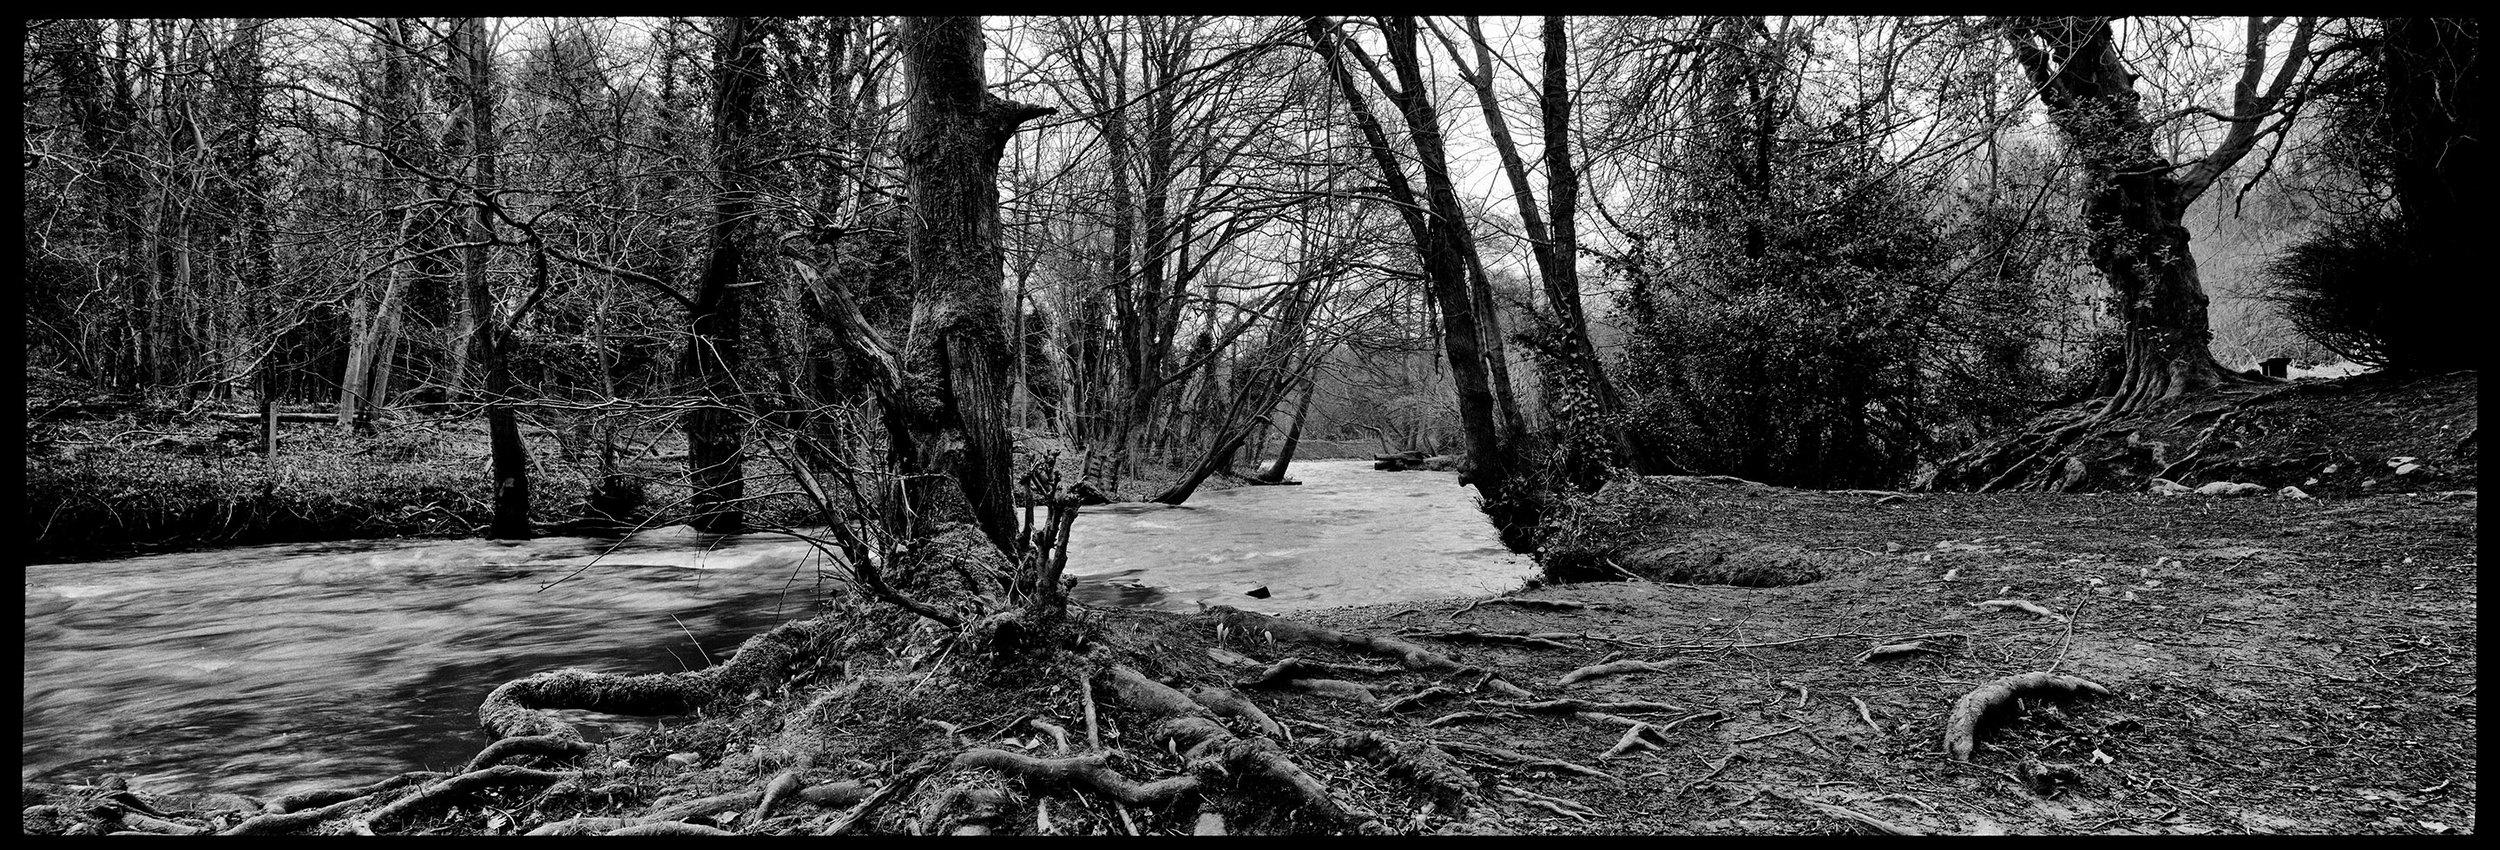 Alyn Waters Country Park.